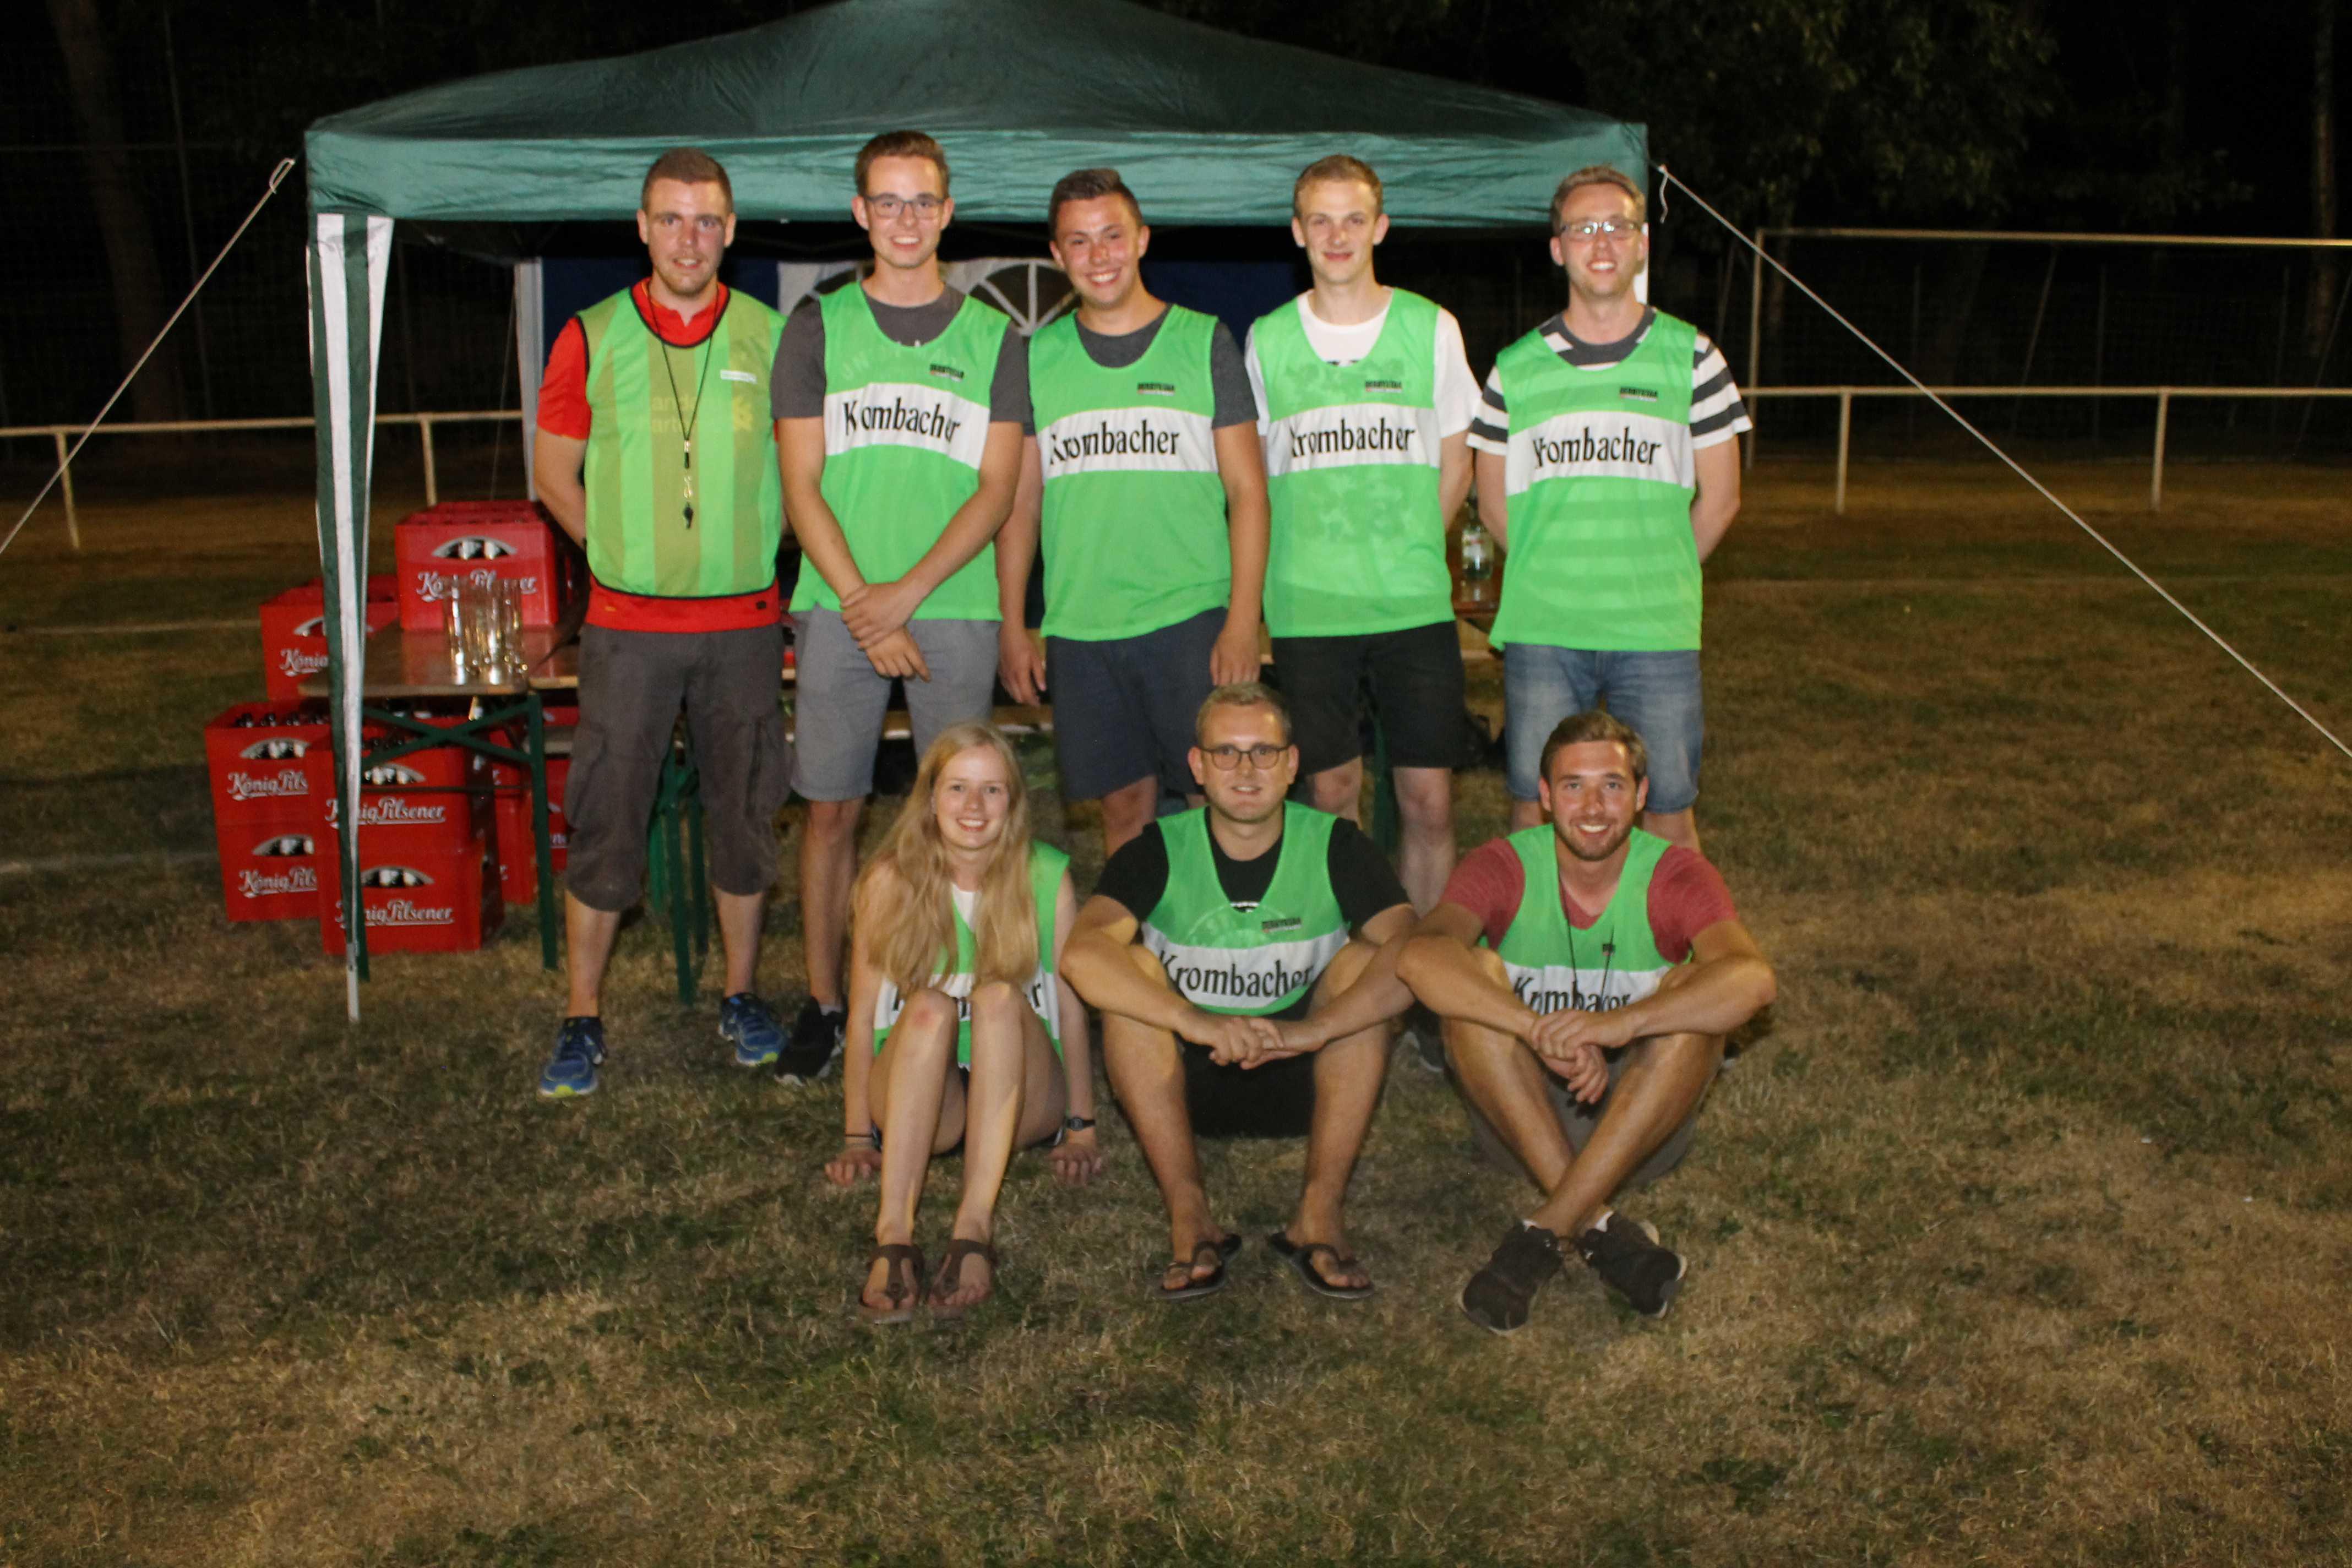 2018-07-27 Sportwoche - Flunkyball Turnier (99)